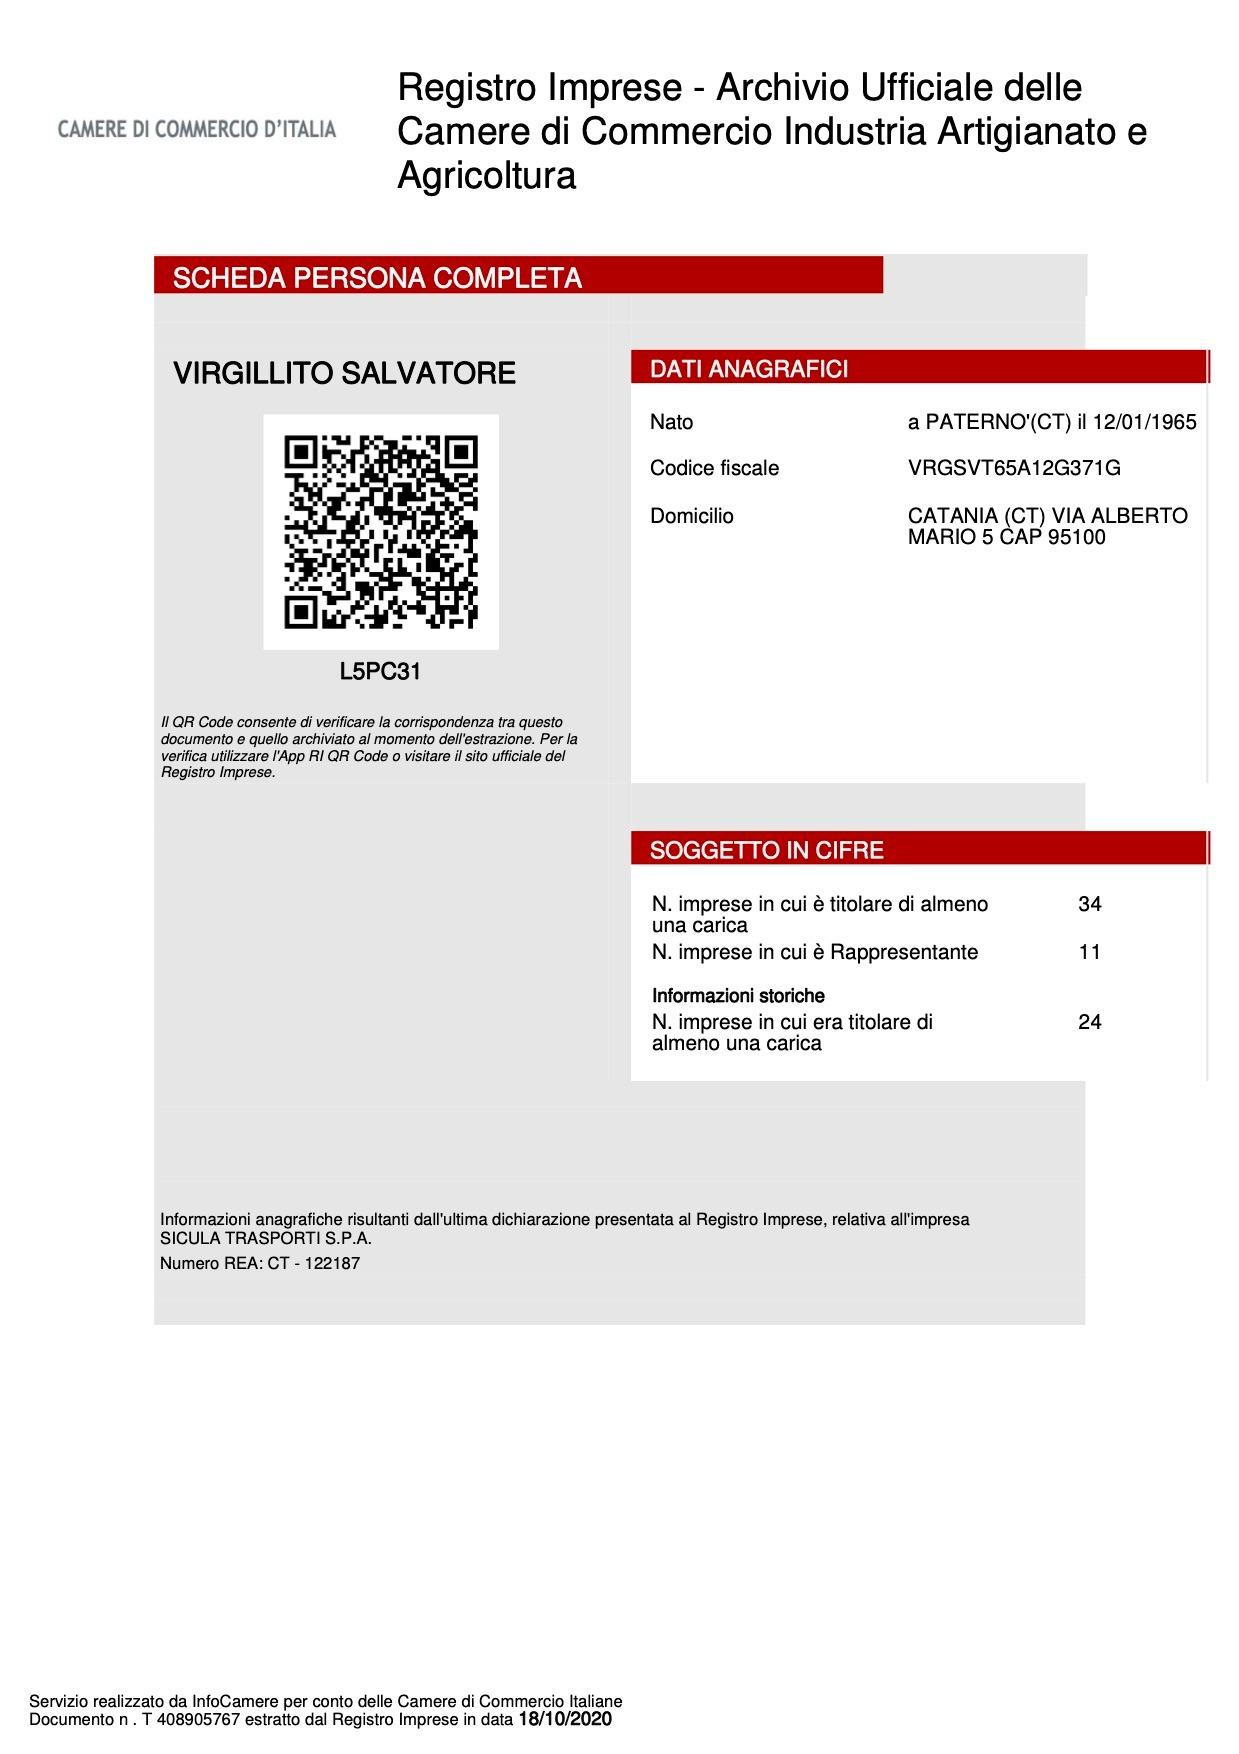 virgillitosalvatore1-1603425471.jpg